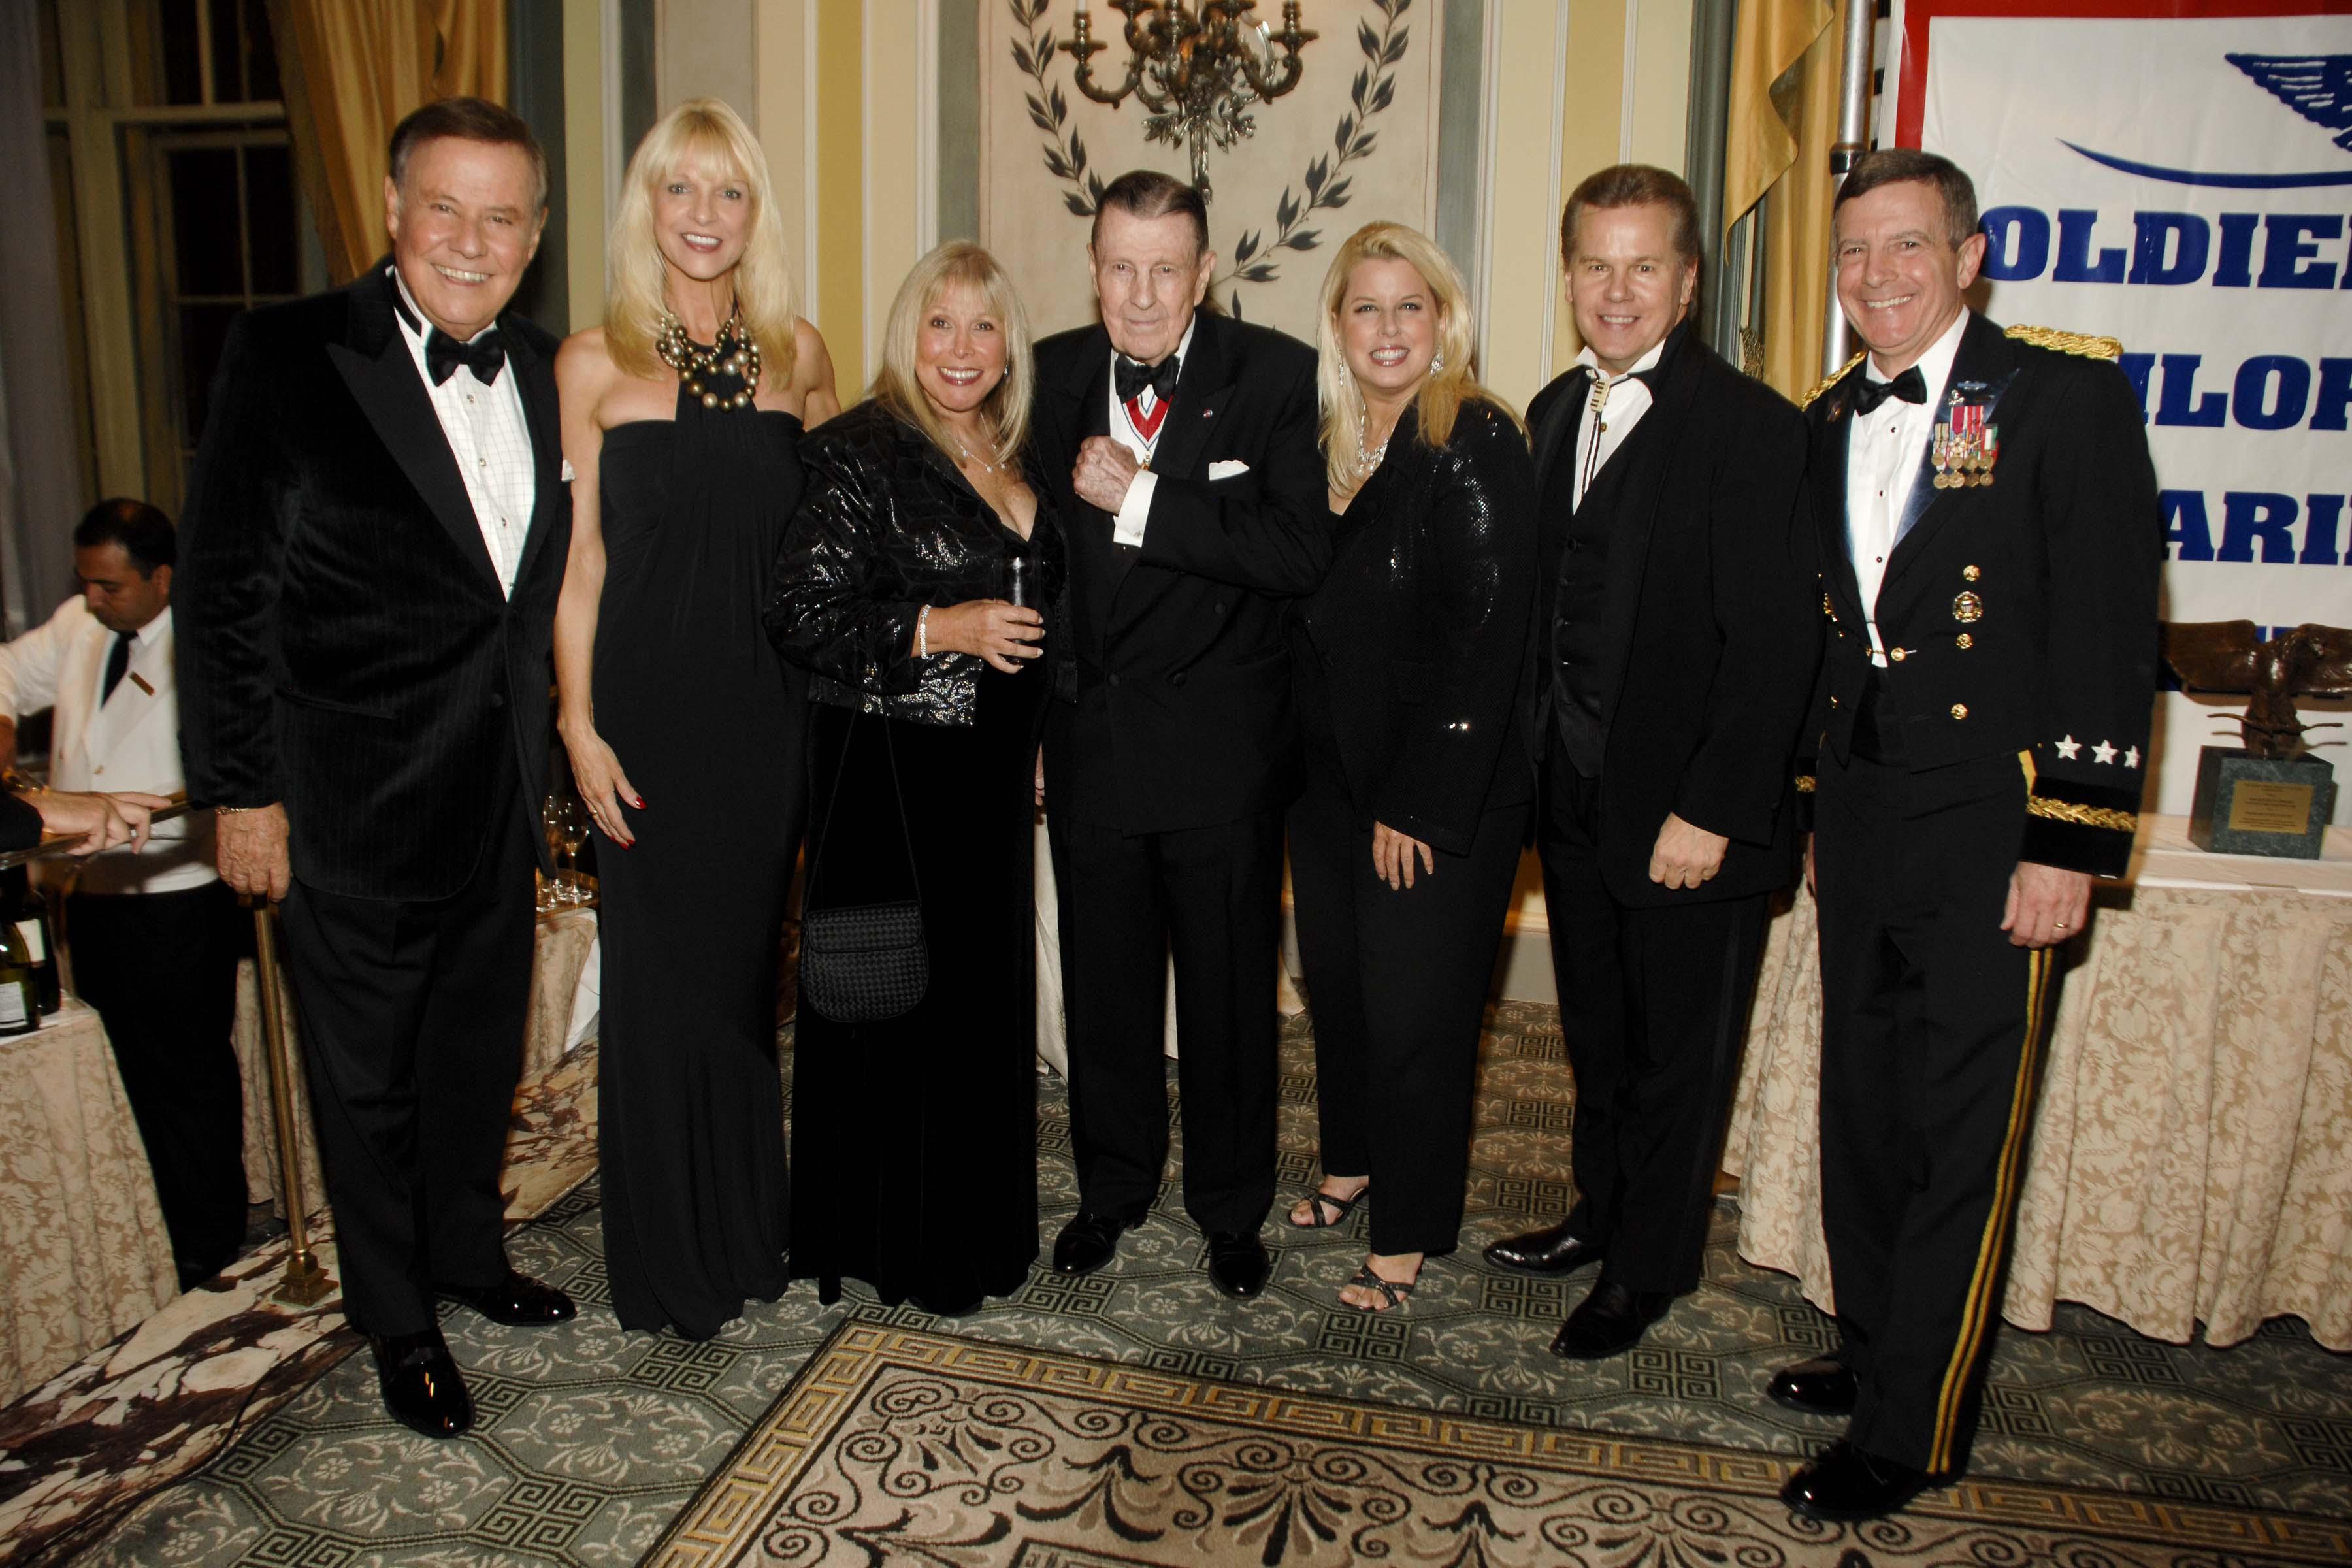 L to R Marvin Scott, Margo Catsimitidis, Lorri Scott, Ivan Oolensky, Rita Tomaczek Bednarek, General William J.Troy